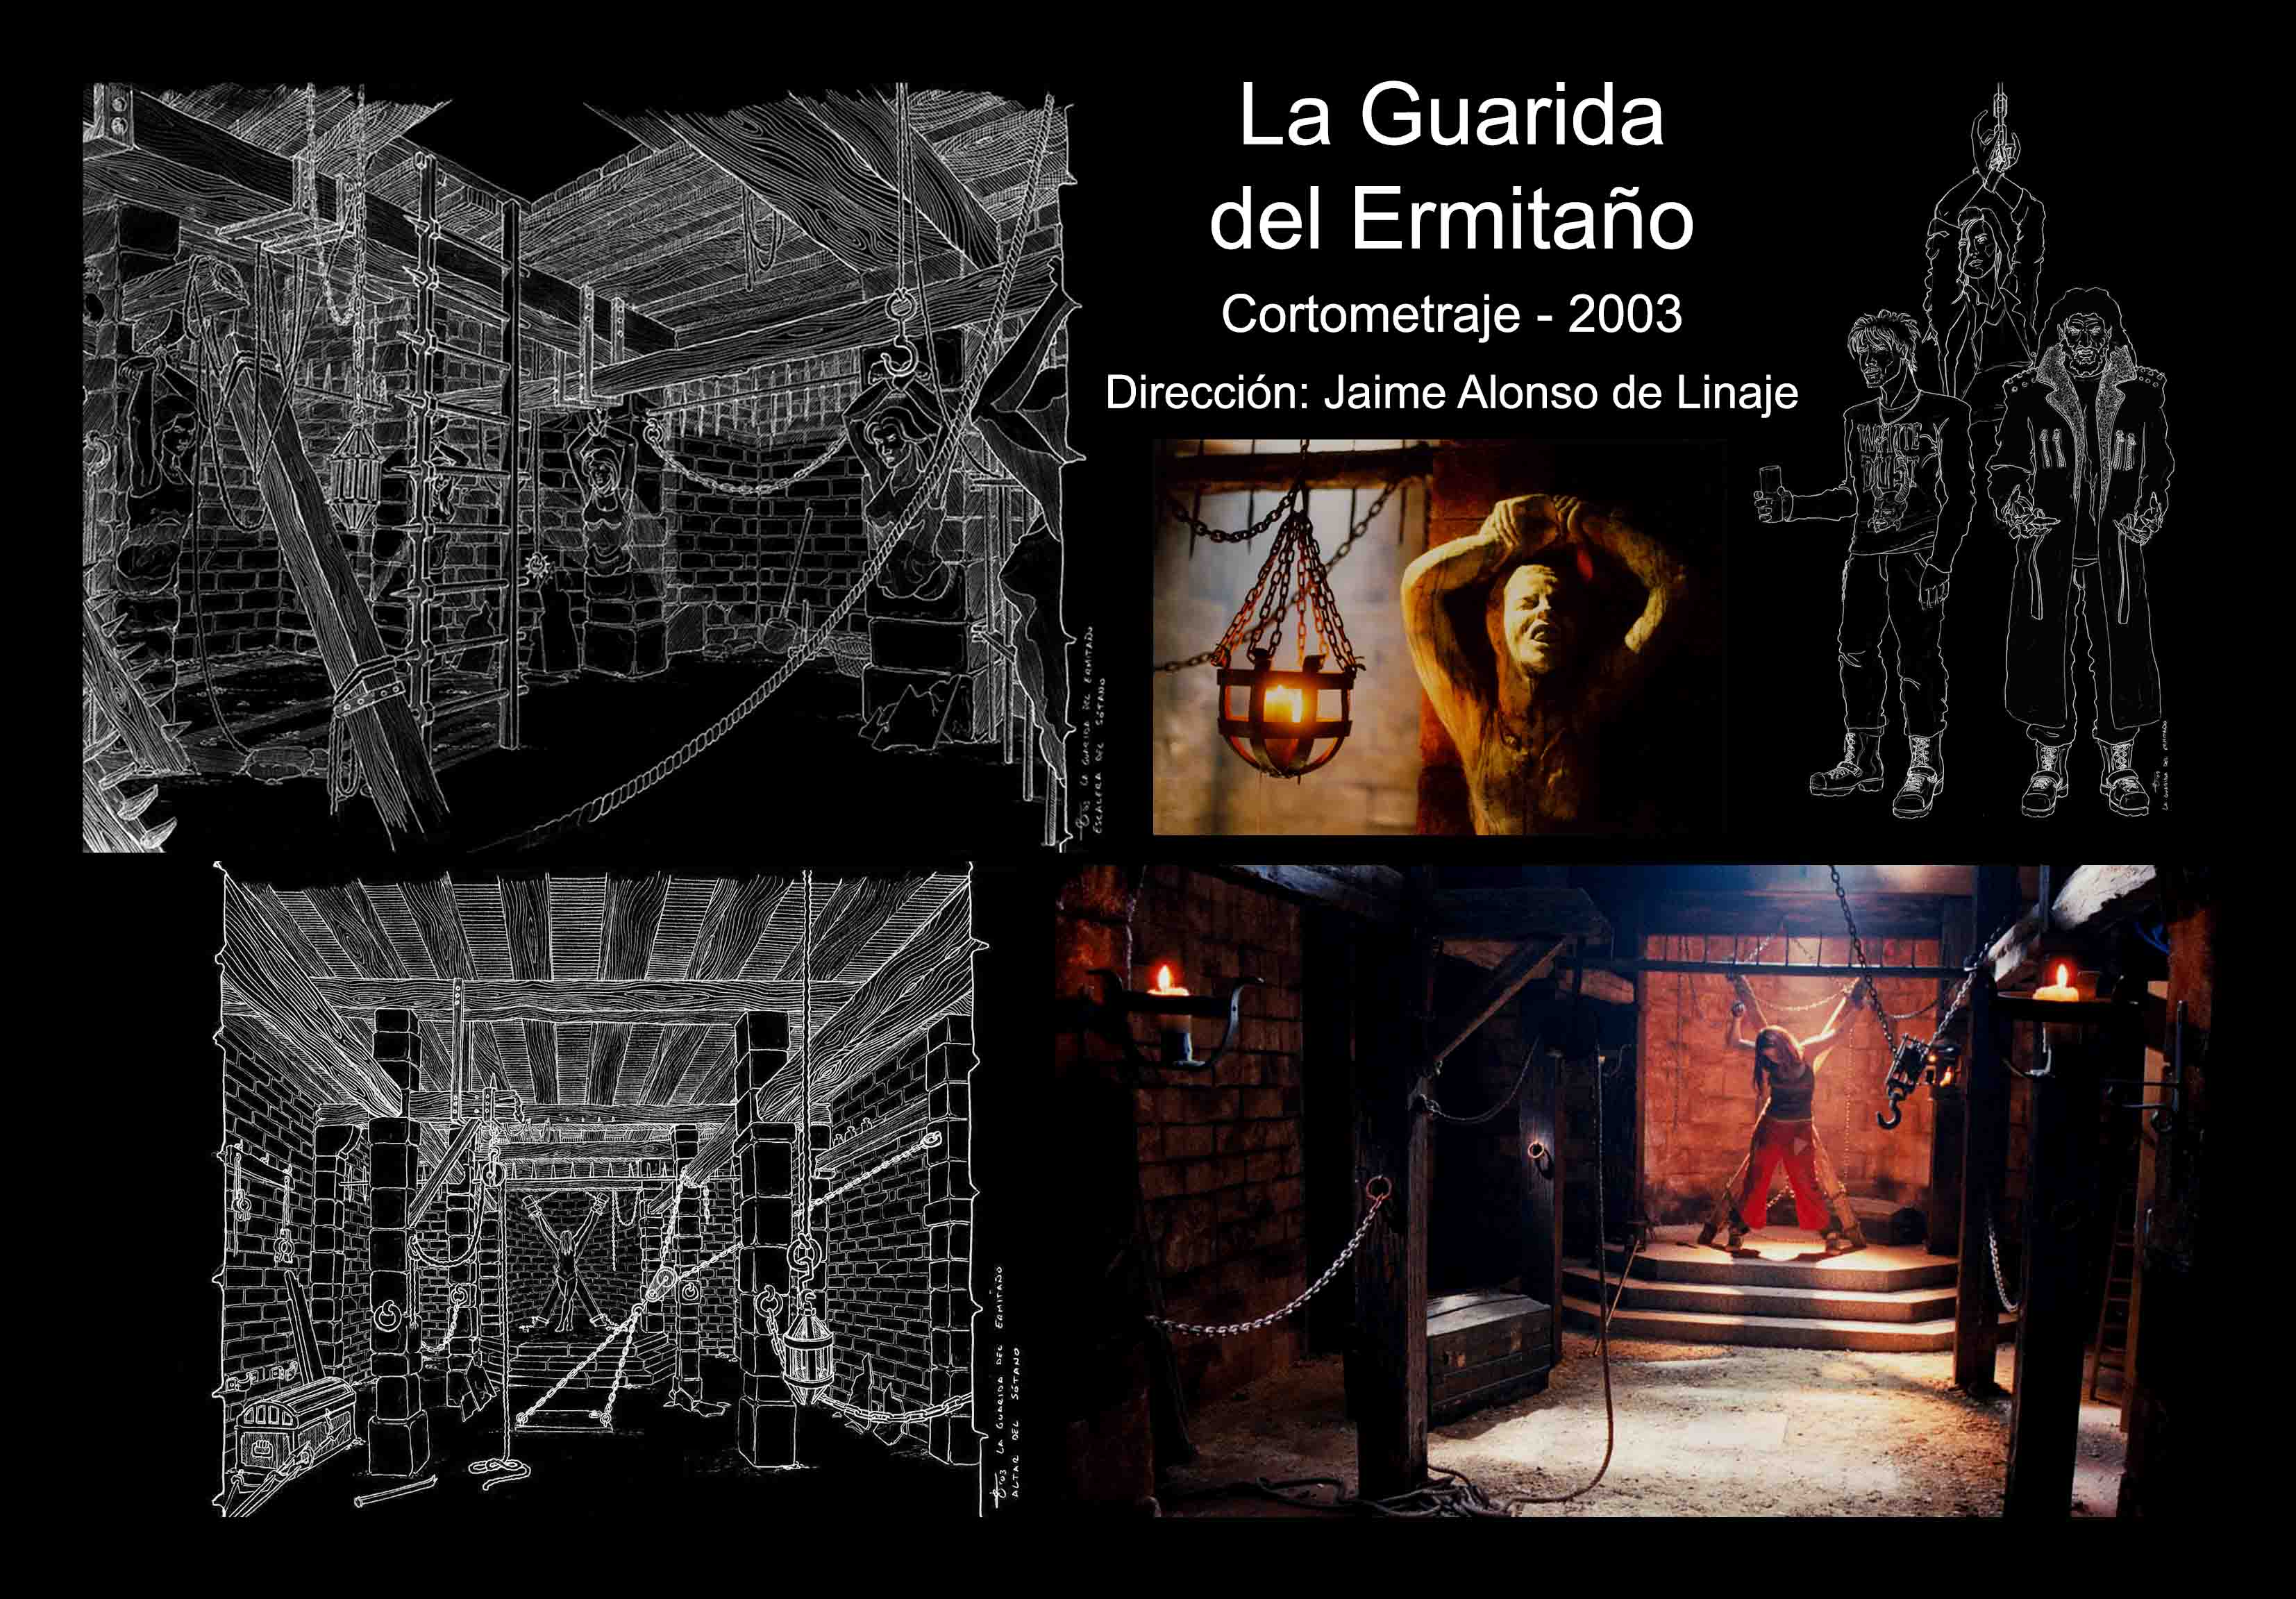 David Temprano c2003 La Guarida del Ermitaño 1